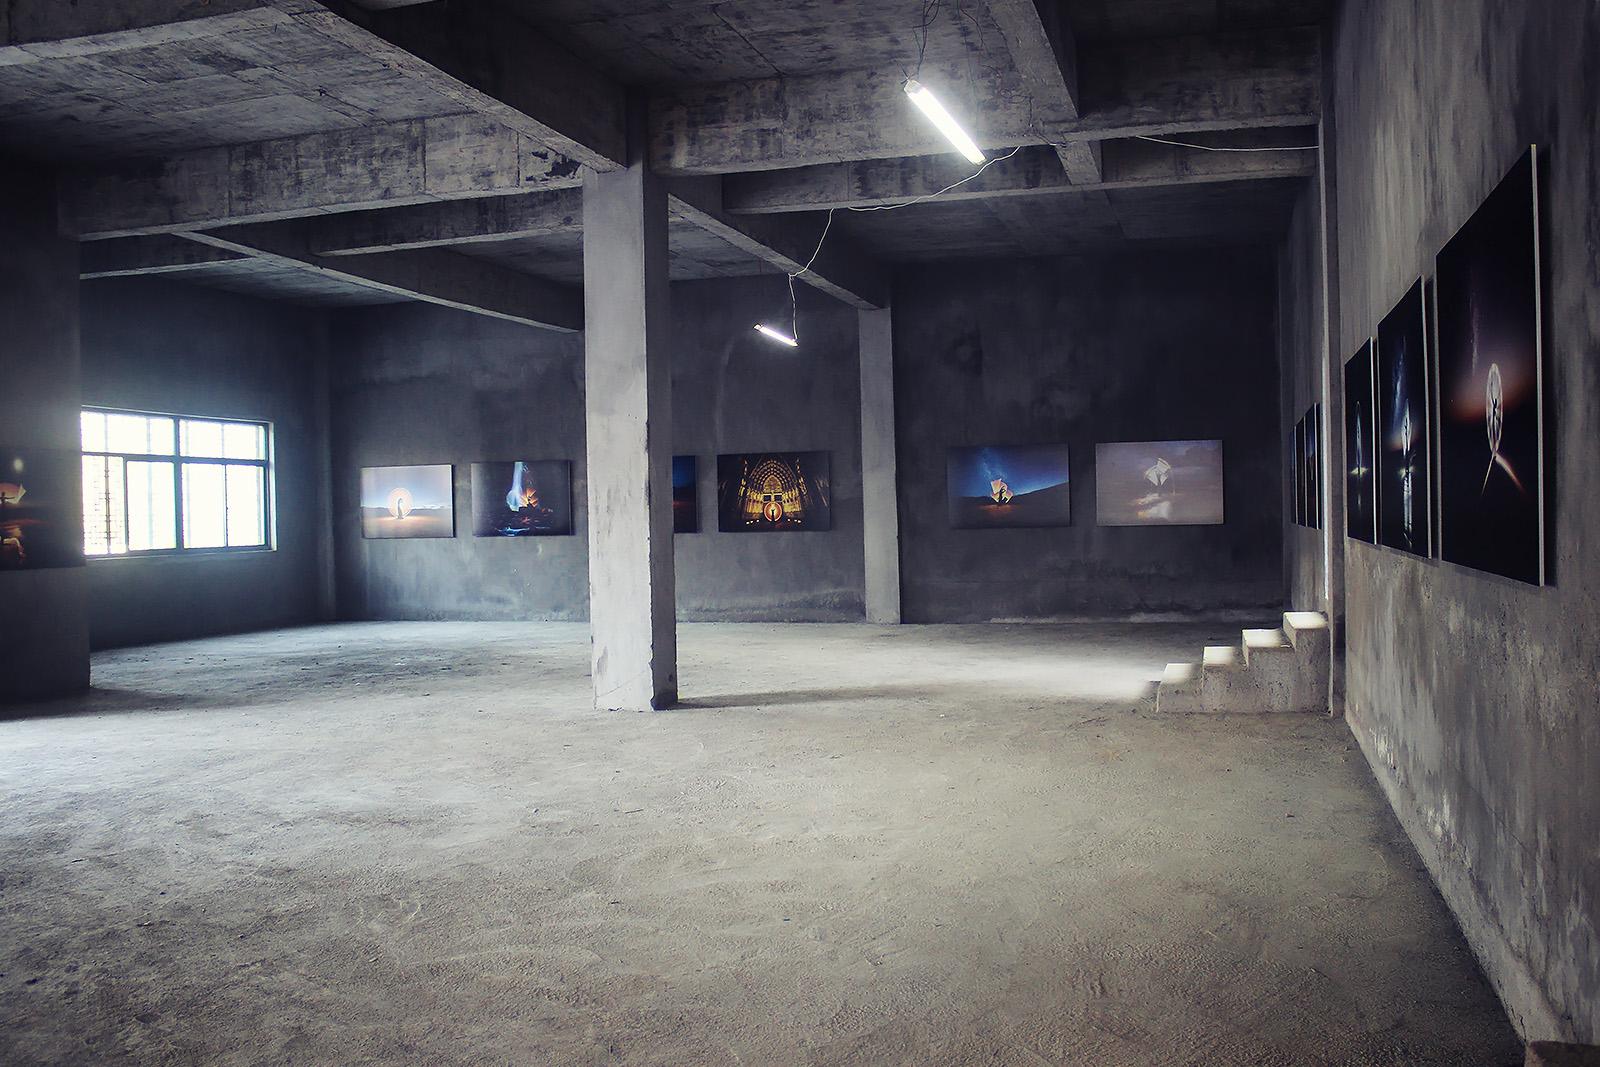 light-painting-exhibition-china-eric-pare-kim-henry-huangshan-international-photography-festival-11th-yixian-4-jpg-g788.jpg